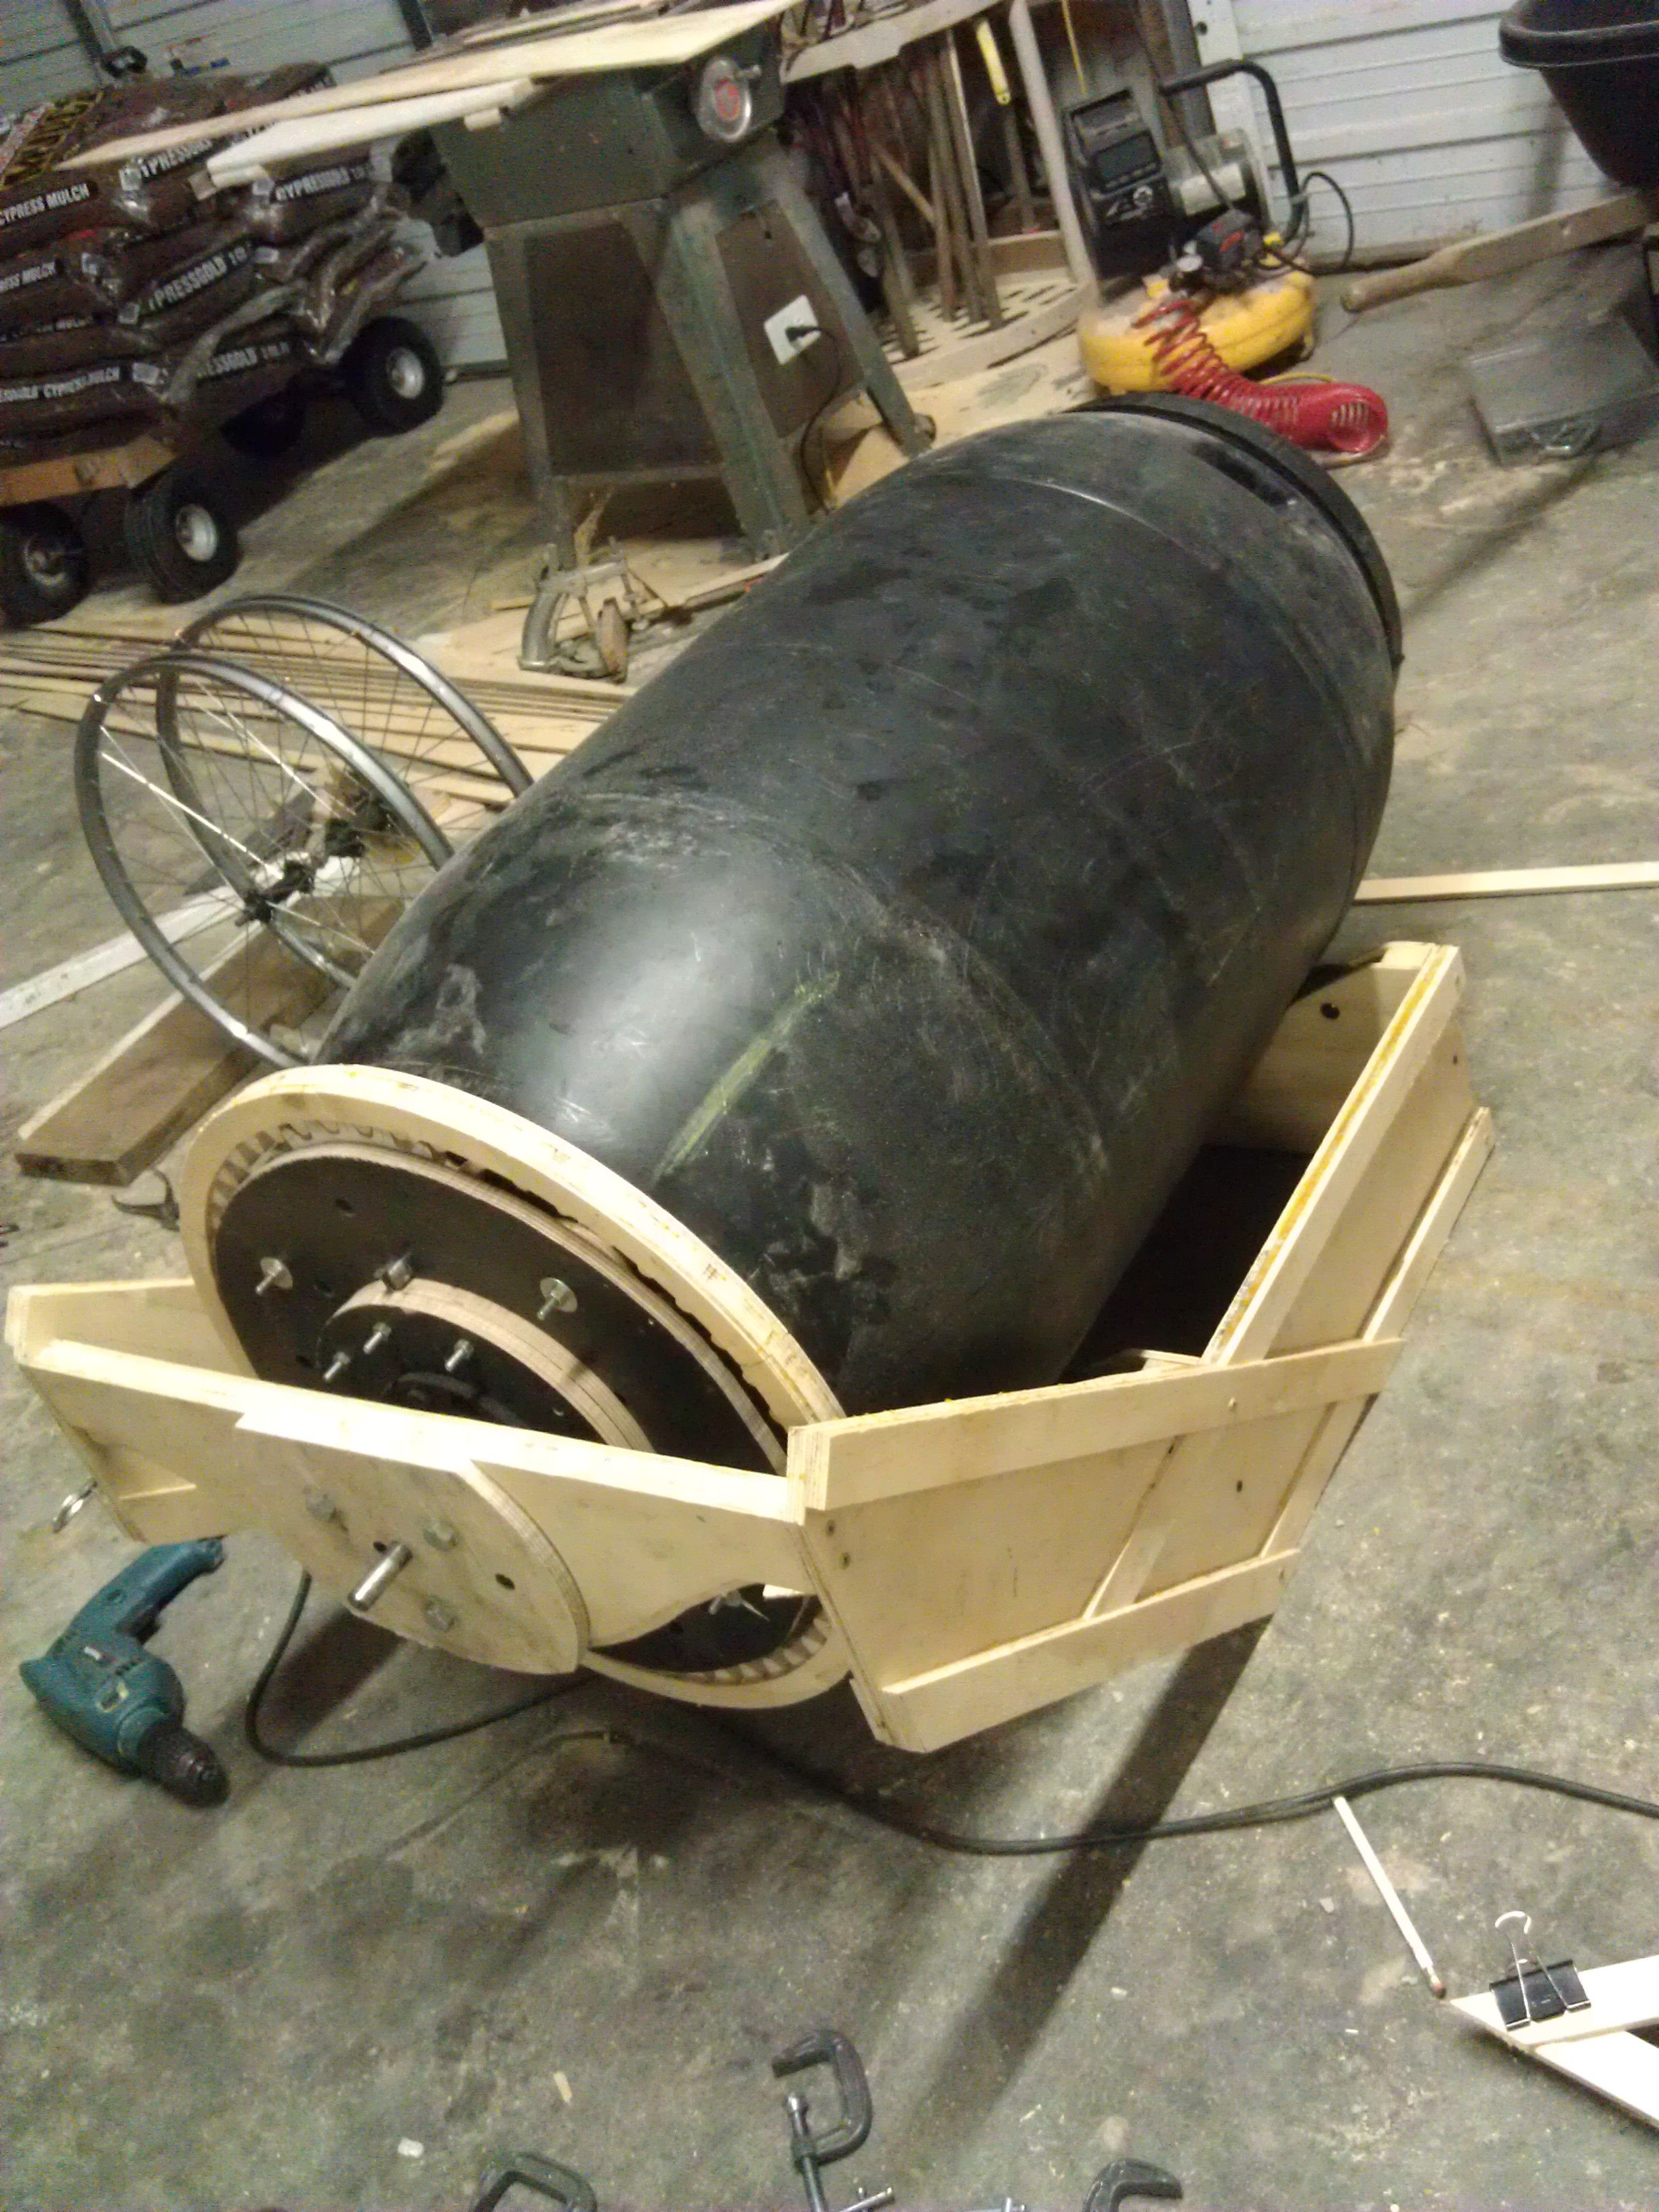 Wheelbarrow Concrete Mixer By Dynamodan Homemade Concrete Mixer Adapted From A Pickle Barrel And Mounted To Concrete Mixers Concrete Concrete Diy